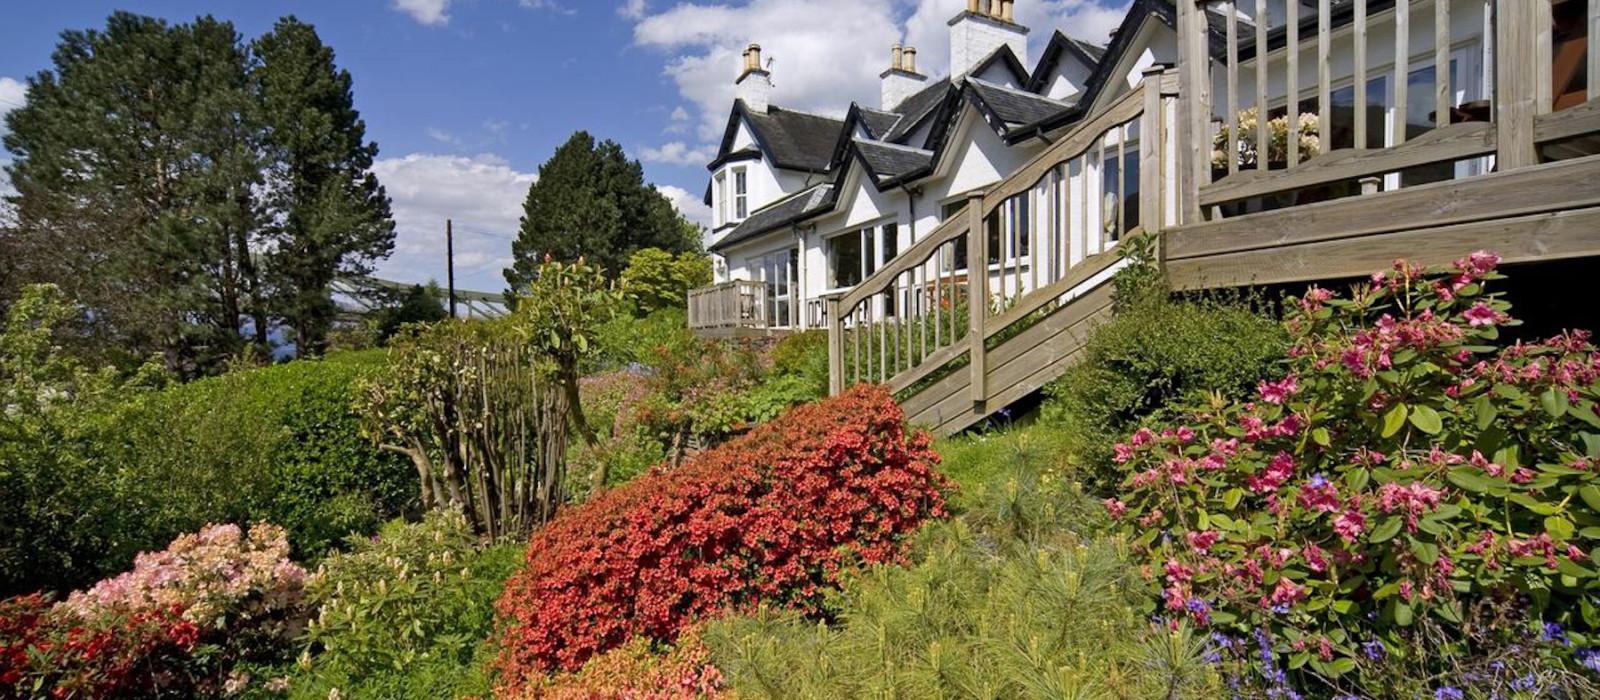 Hotel Loch Leven  UK & Ireland